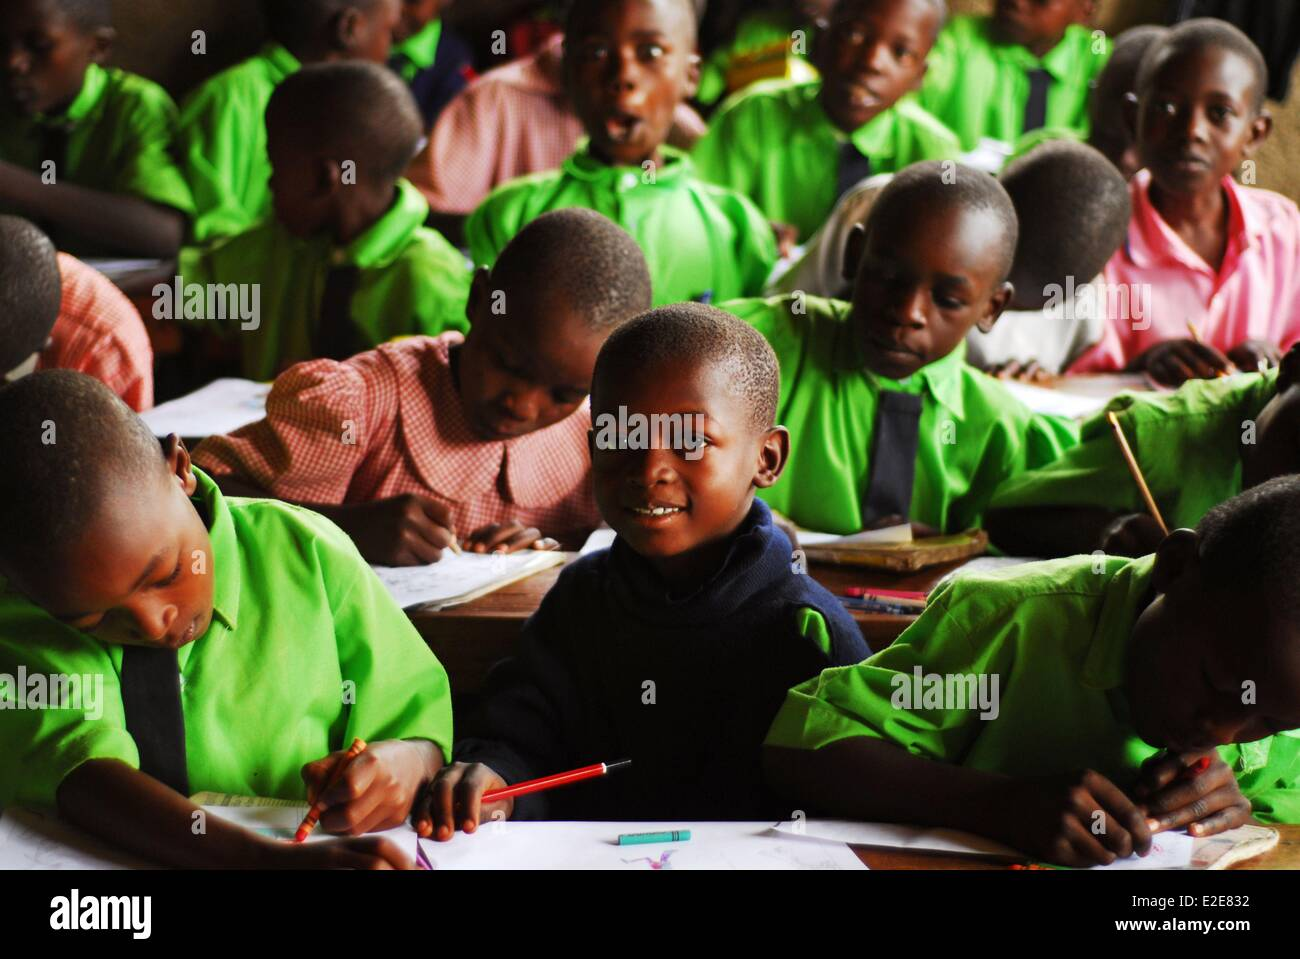 Kenya, Kakamega, black african schoolchildren studying with a smile in classroom - Stock Image